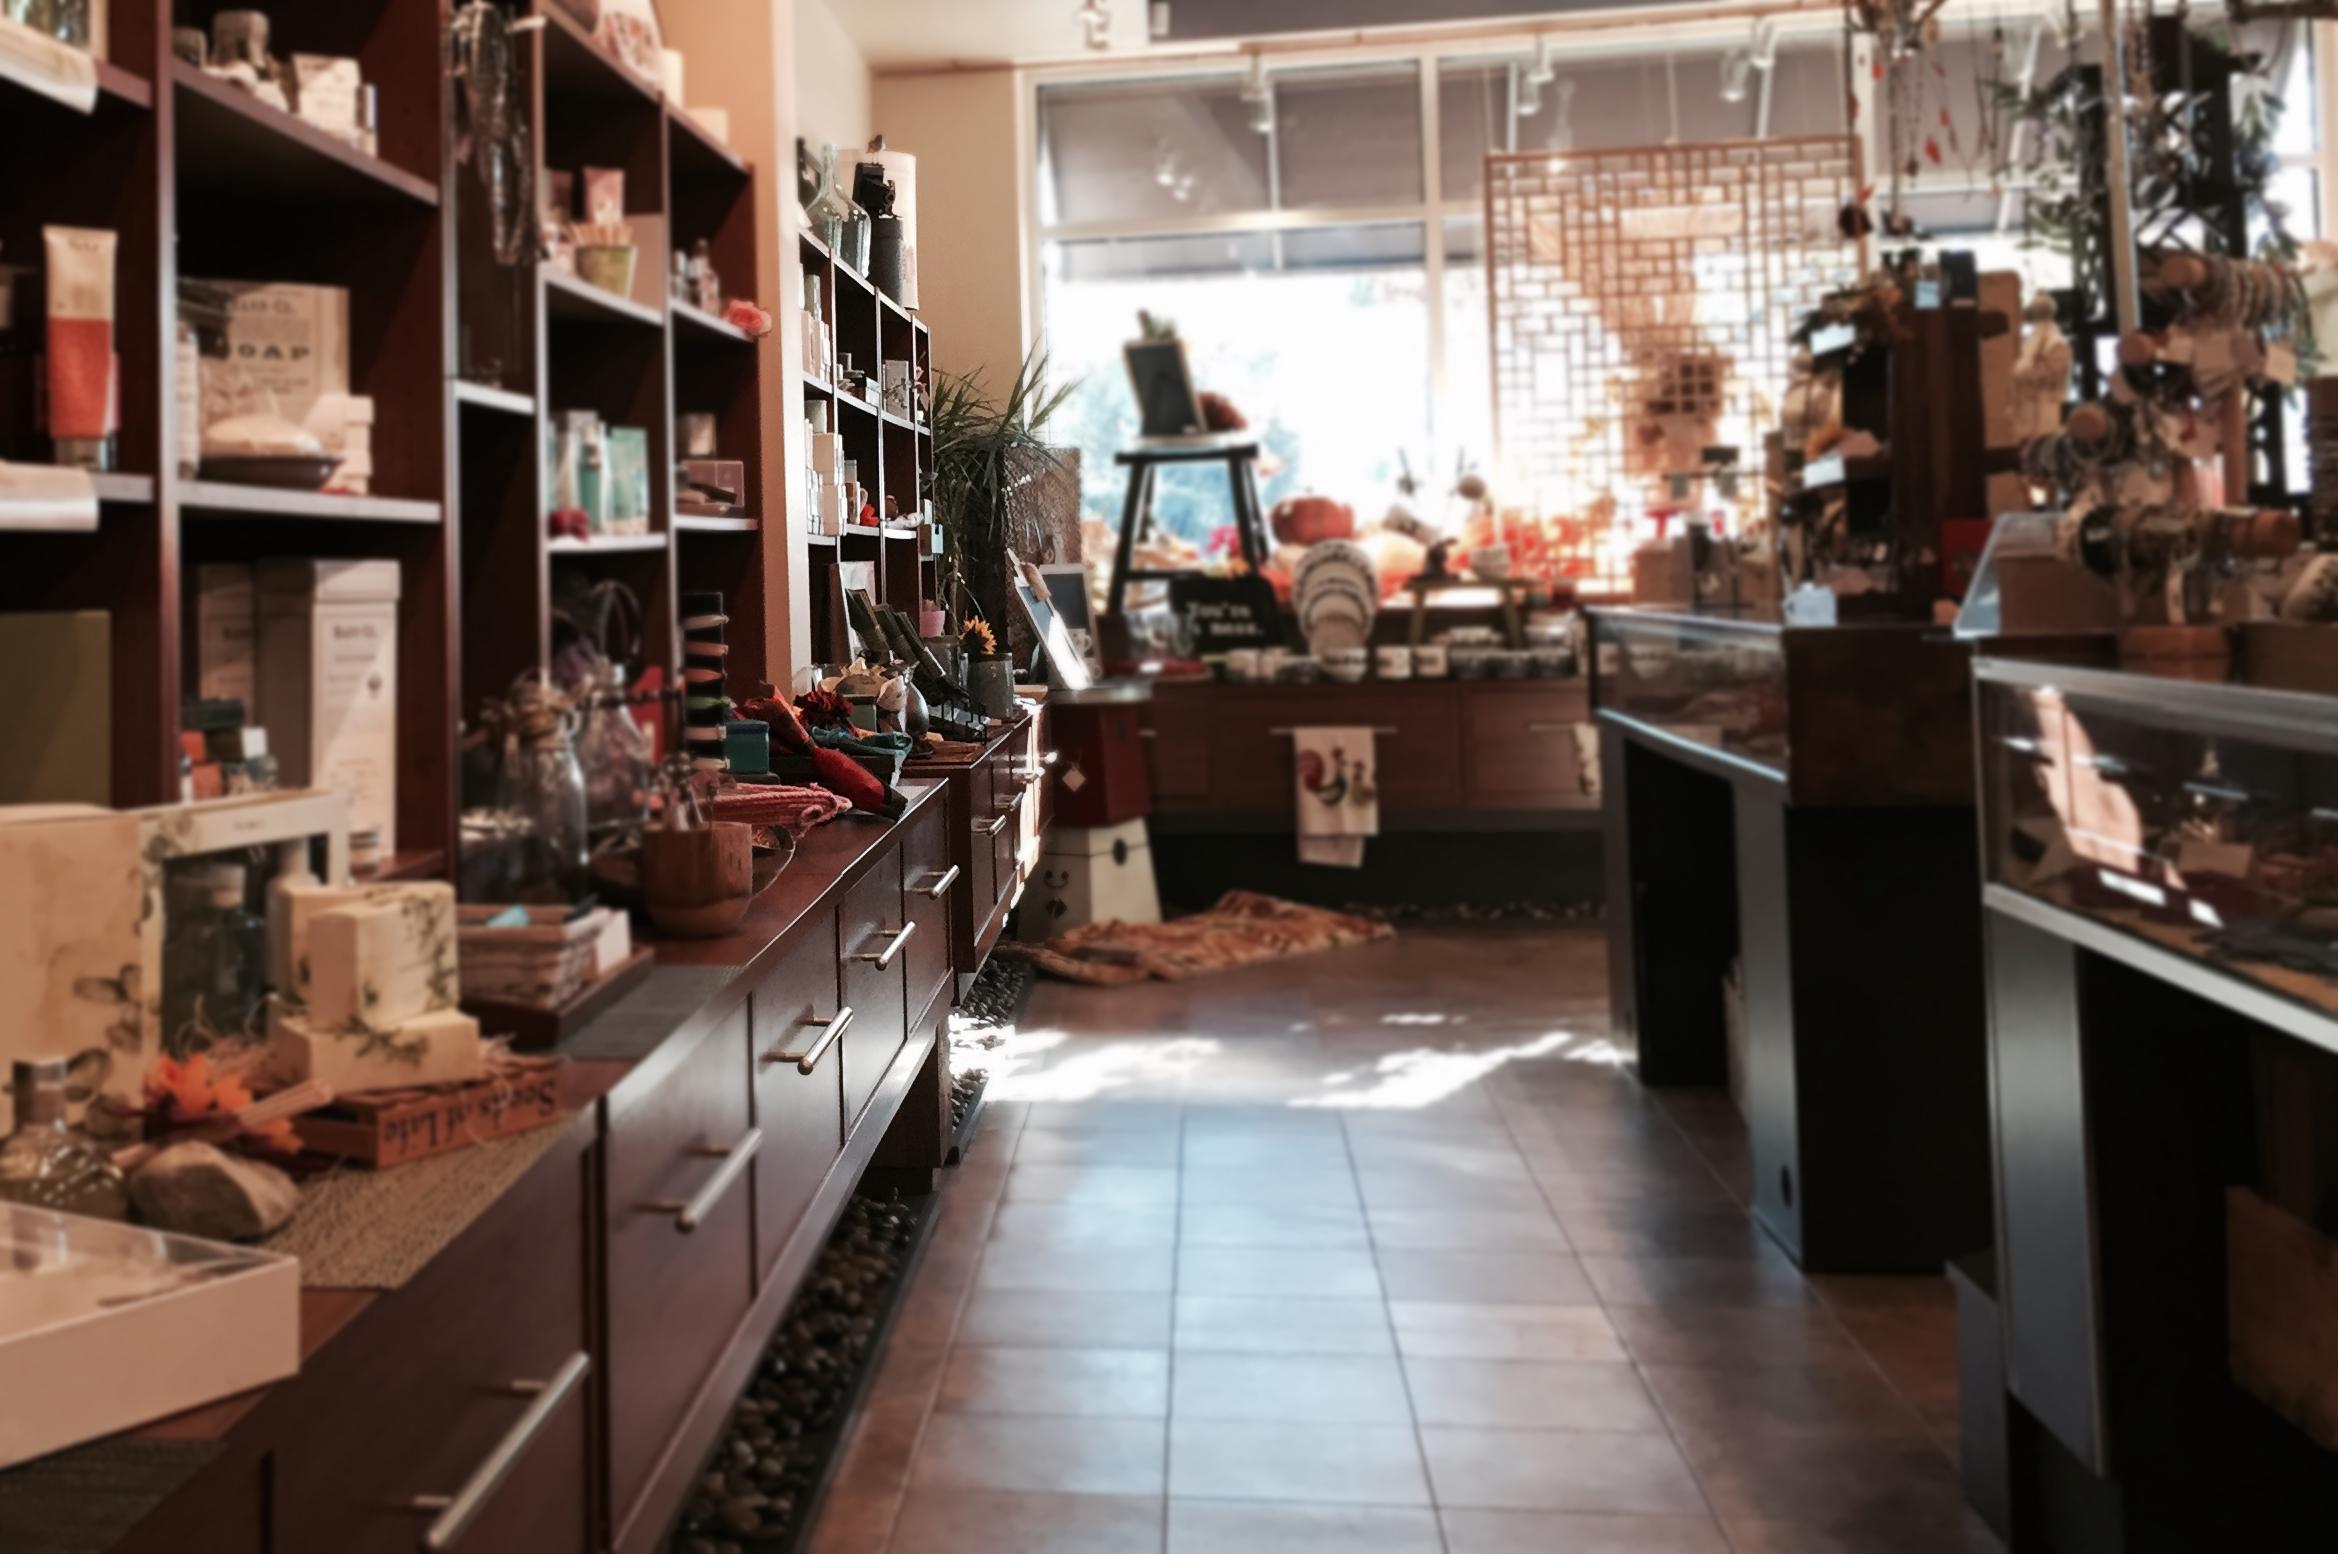 retail long rm shelf_cropblur .jpg